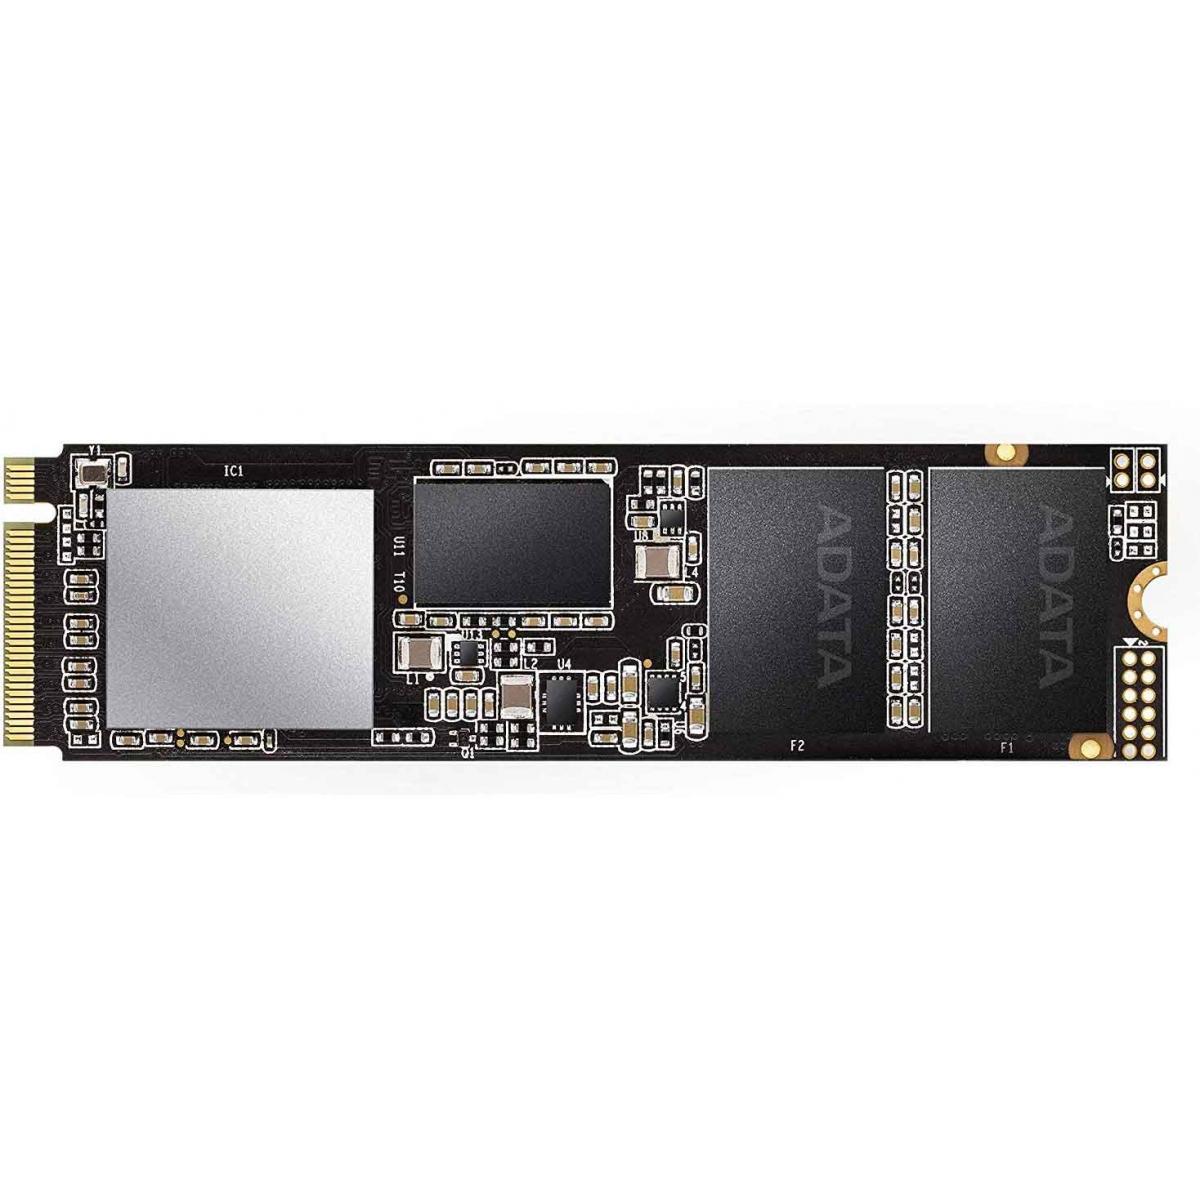 SSD XPG SX8200 PRO, 1TB, M.2 2280, NVMe, Leitura: 3500MBs e Gravação: 3000MBs, ASX8200PNP-1TT-C